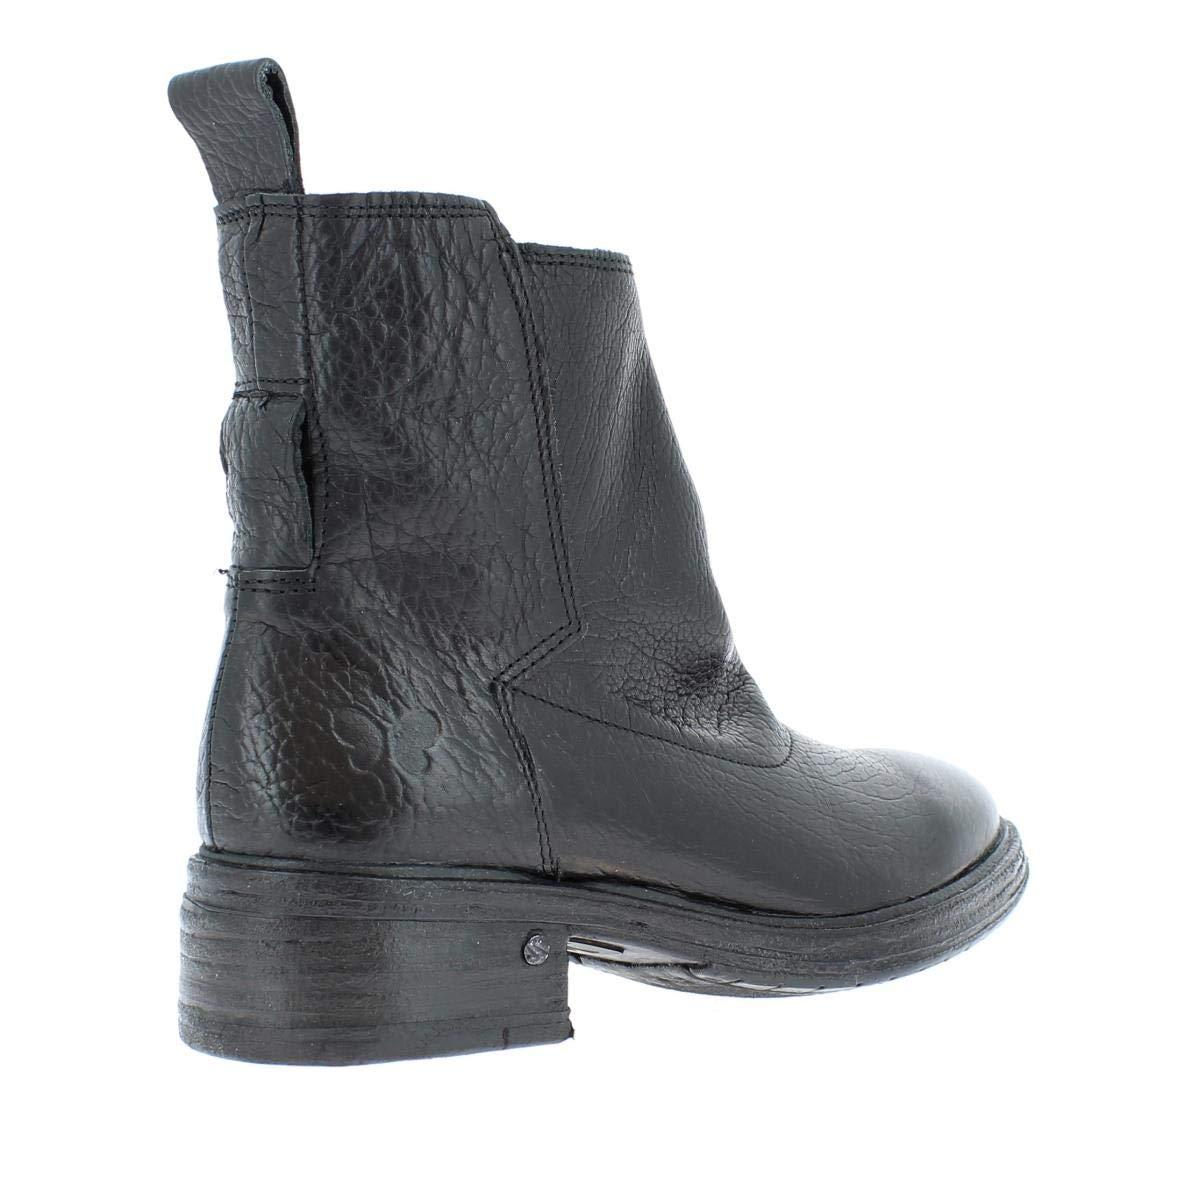 Motif Sacs Felmini Noir Chaussures B480 Et U6aq5Fzw